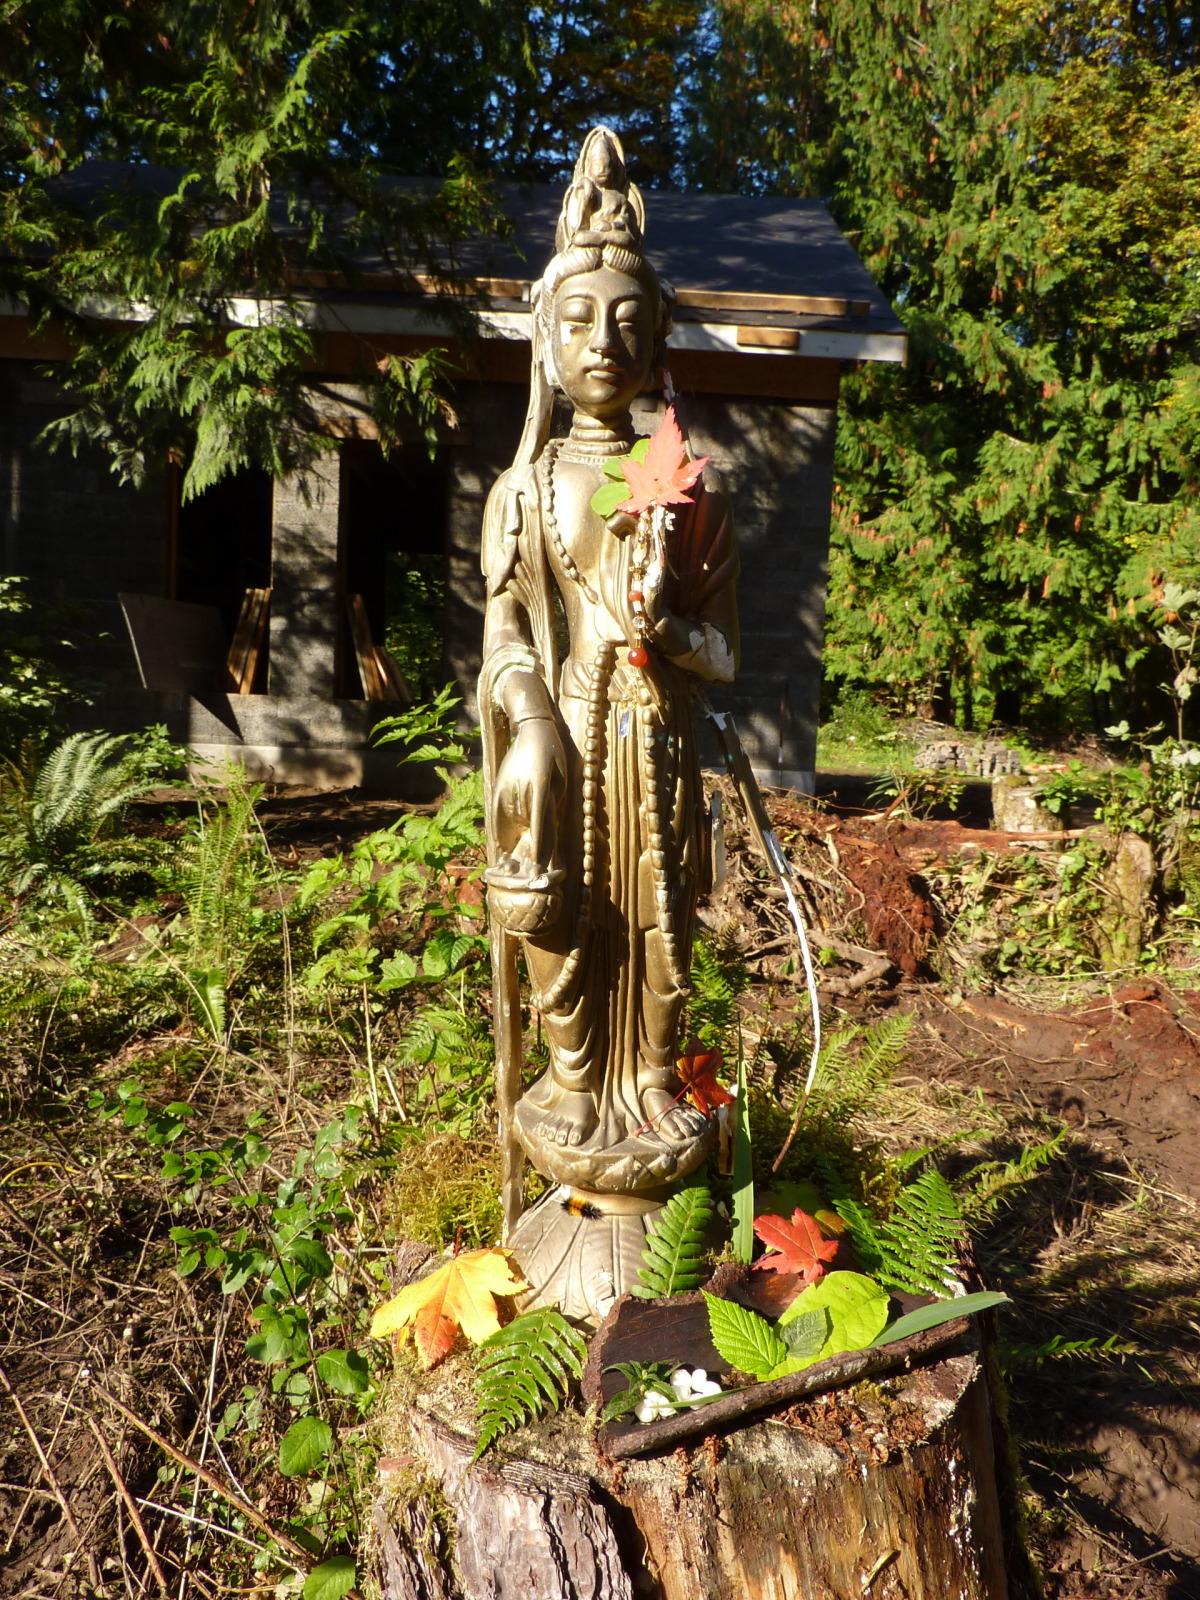 Padma Devi in the Fall